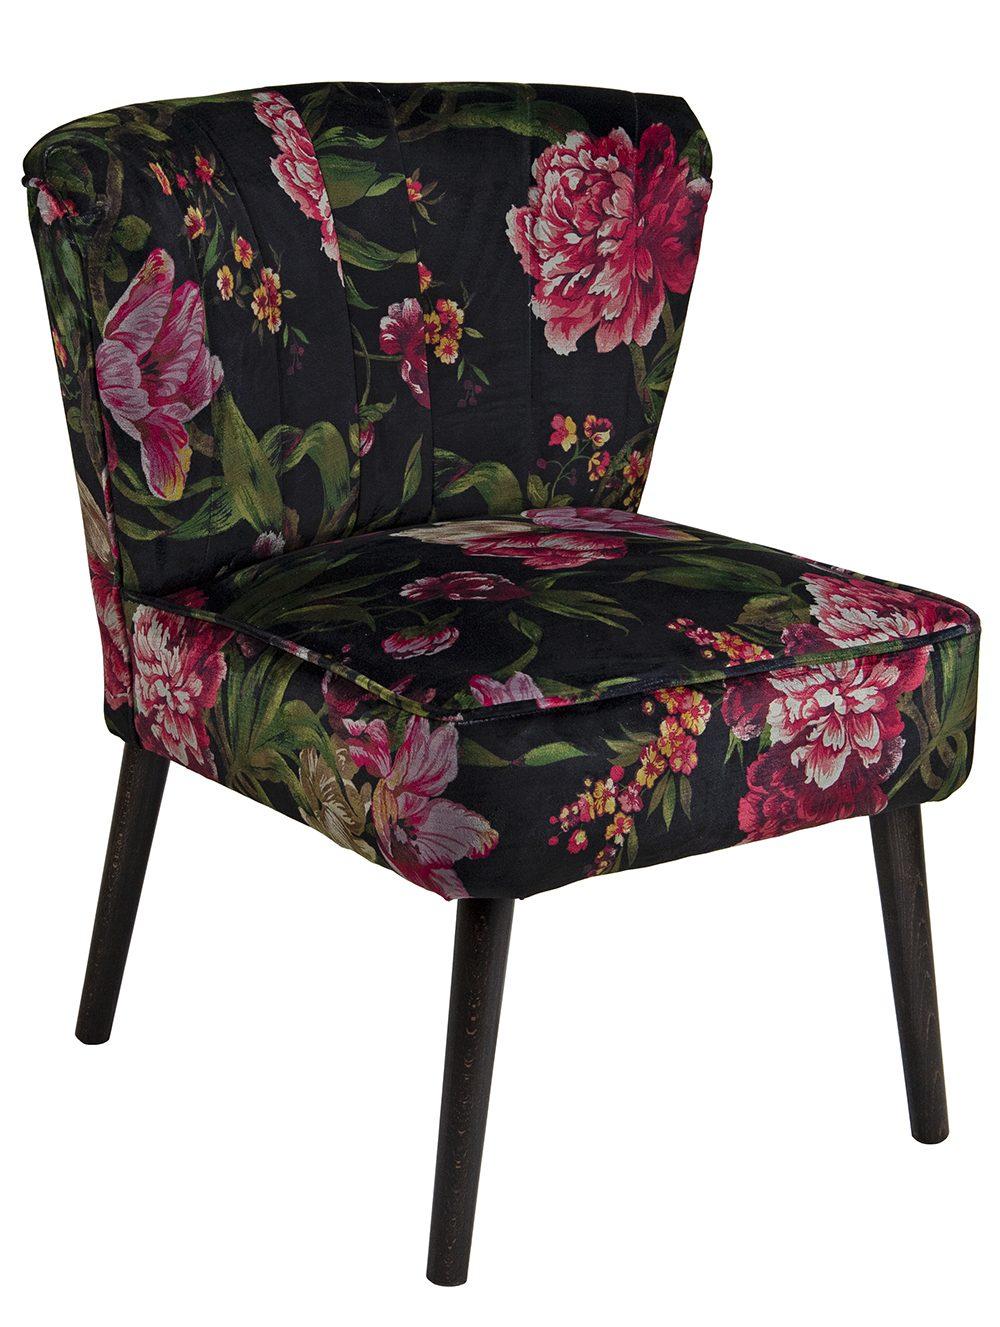 Custom Scallop Lounge Chair